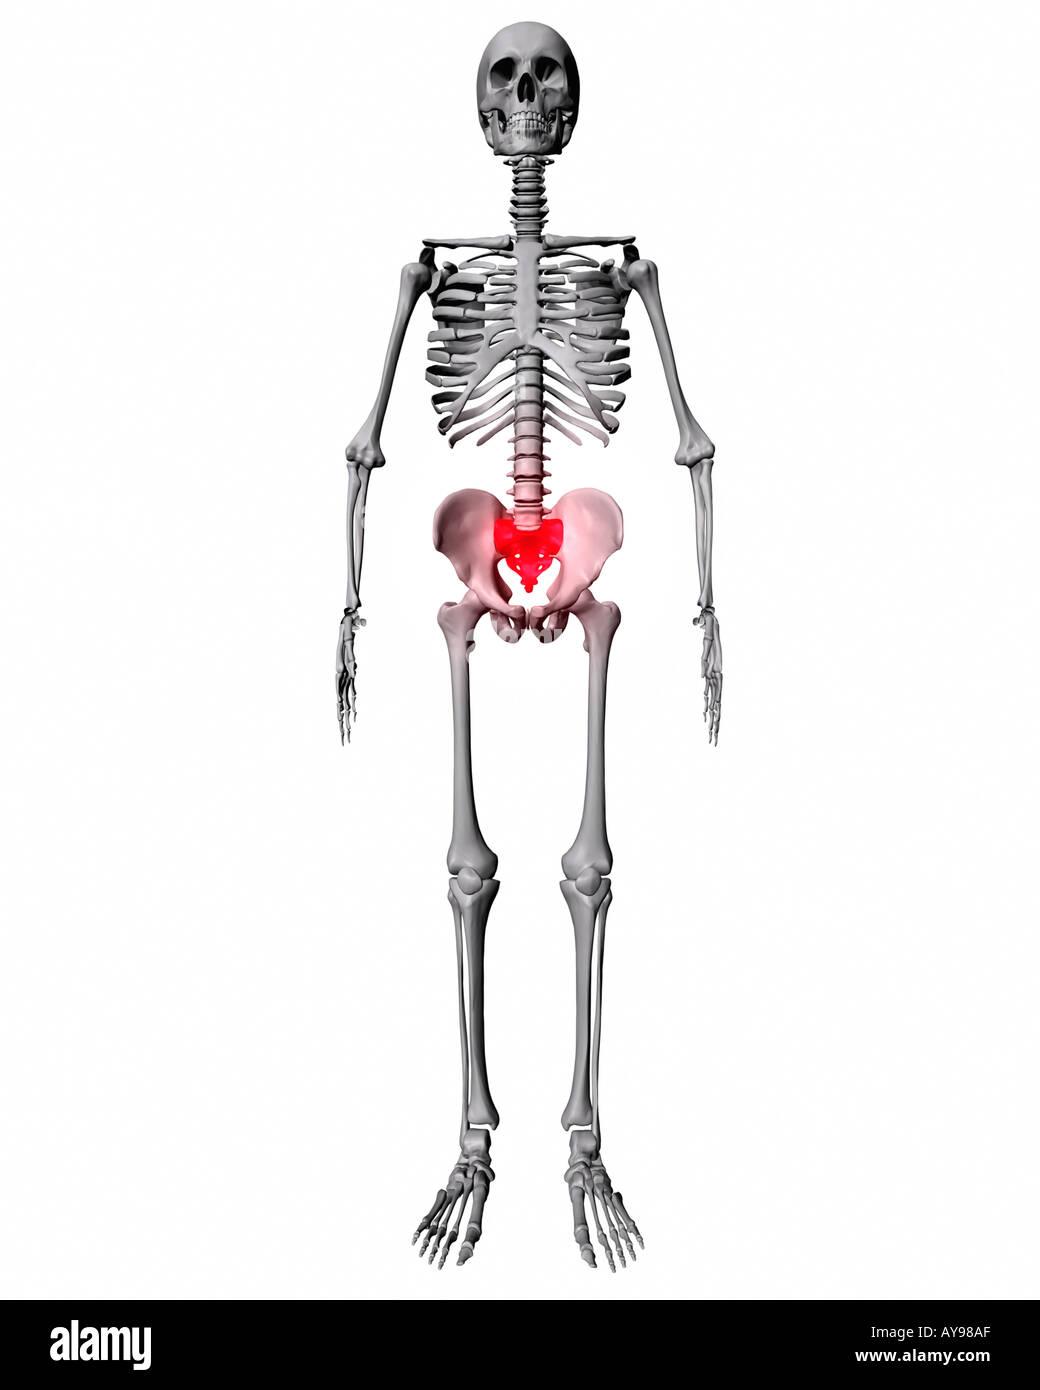 Sacrum highlighted red on skeleton stock photo 1808558 alamy sacrum highlighted red on skeleton ccuart Choice Image